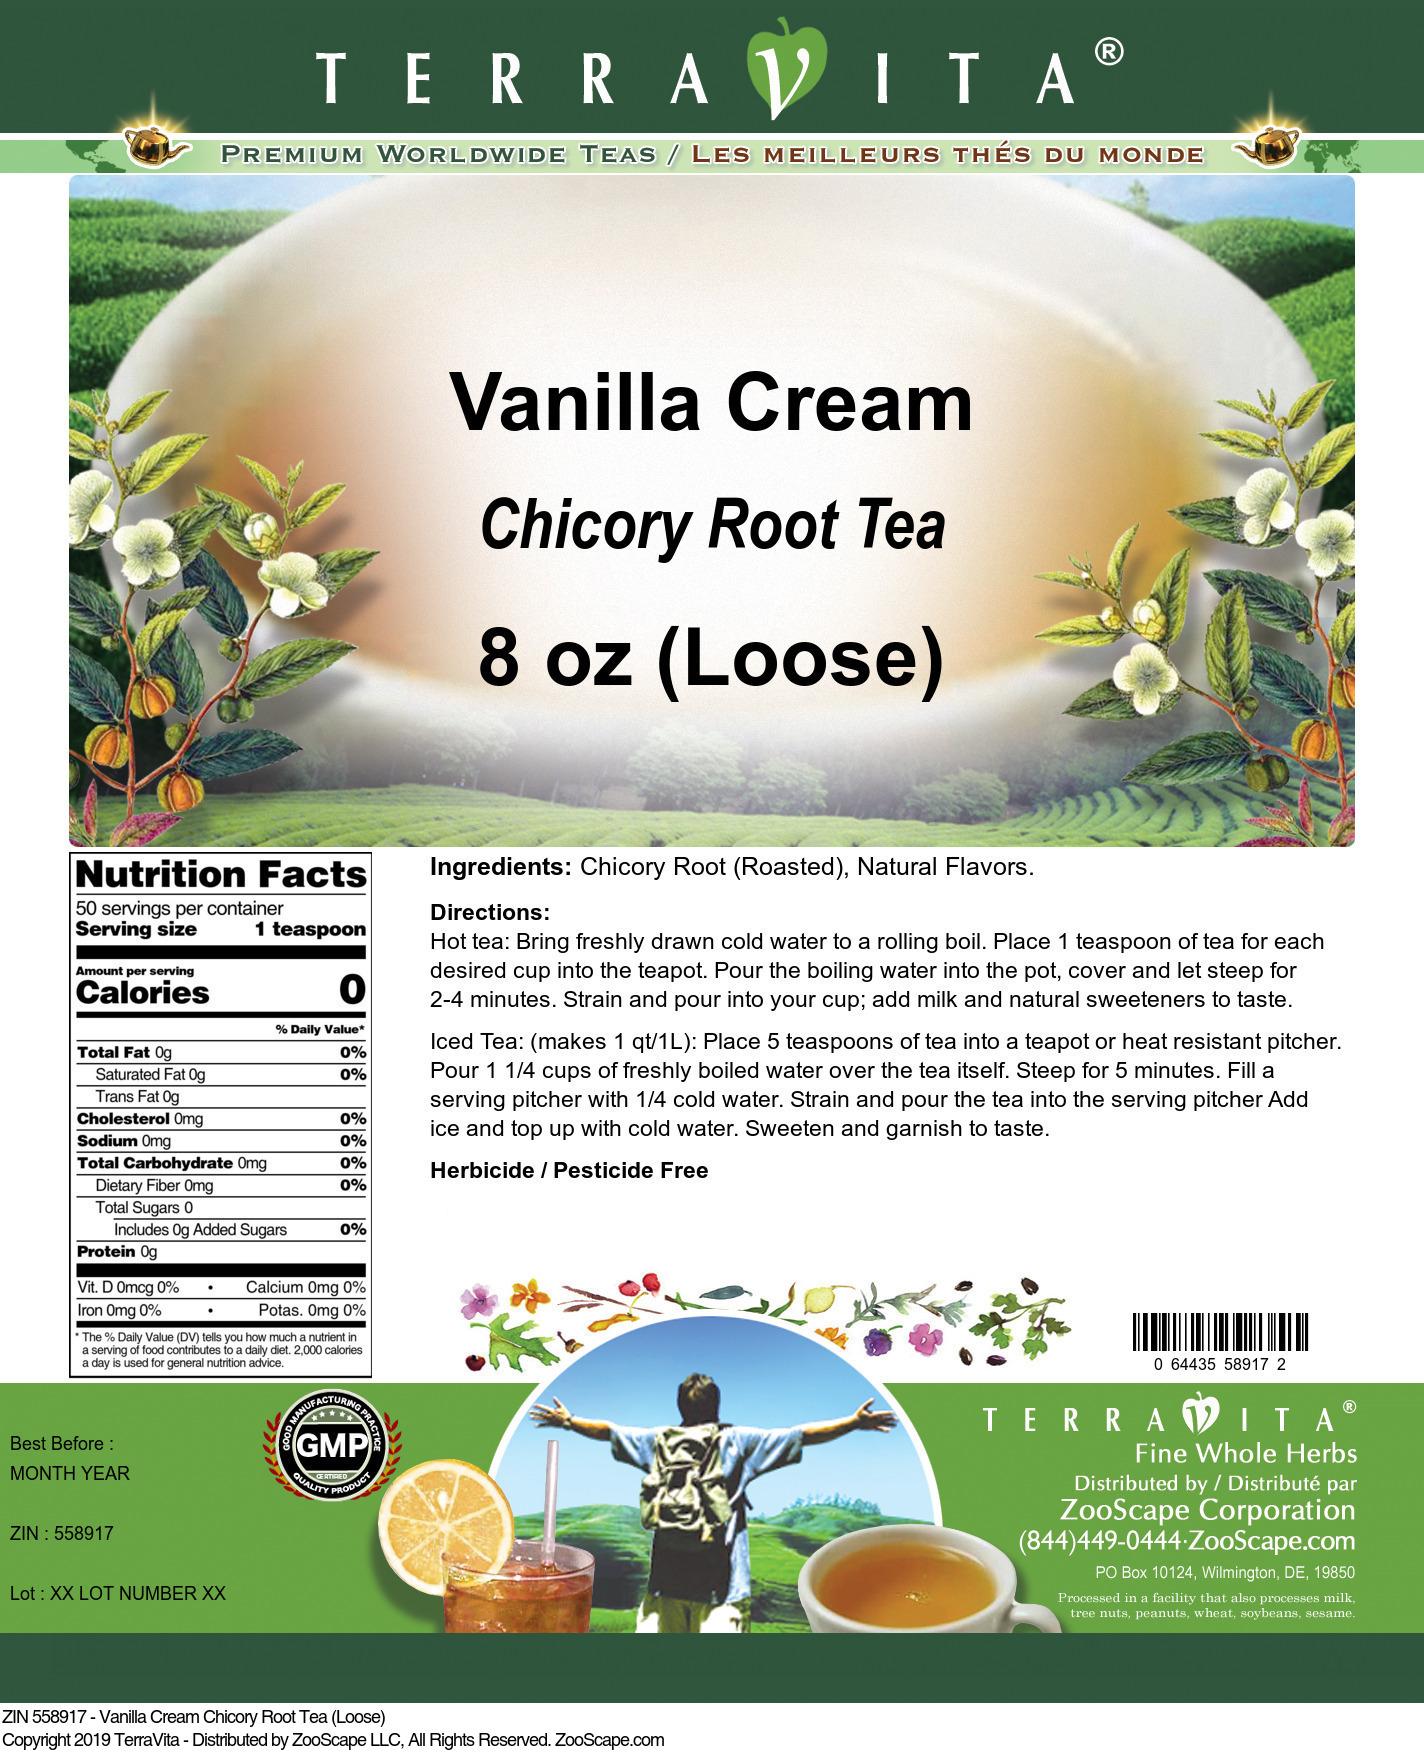 Vanilla Cream Chicory Root Tea (Loose)